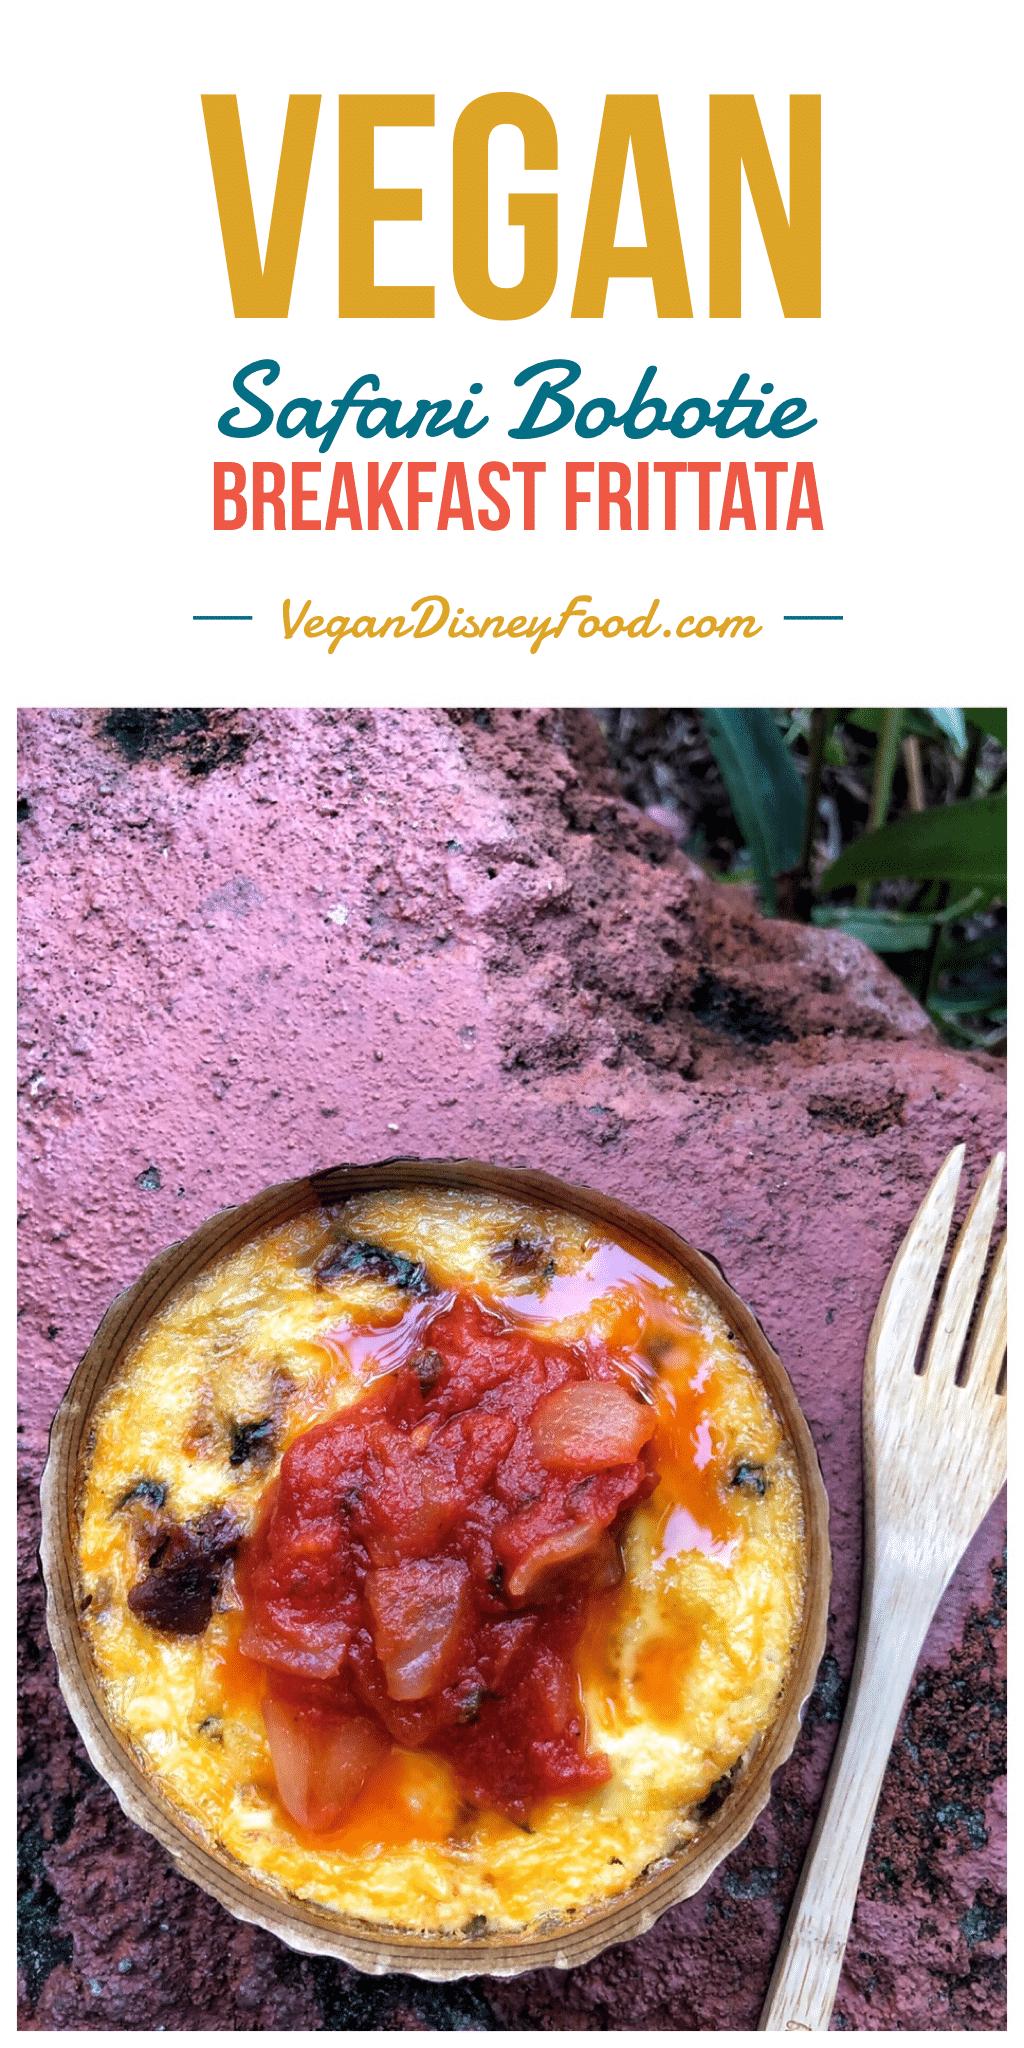 Vegan Safari Bobotie Breakfast at The Mara in Animal Kingdom Lodge at Walt Disney World